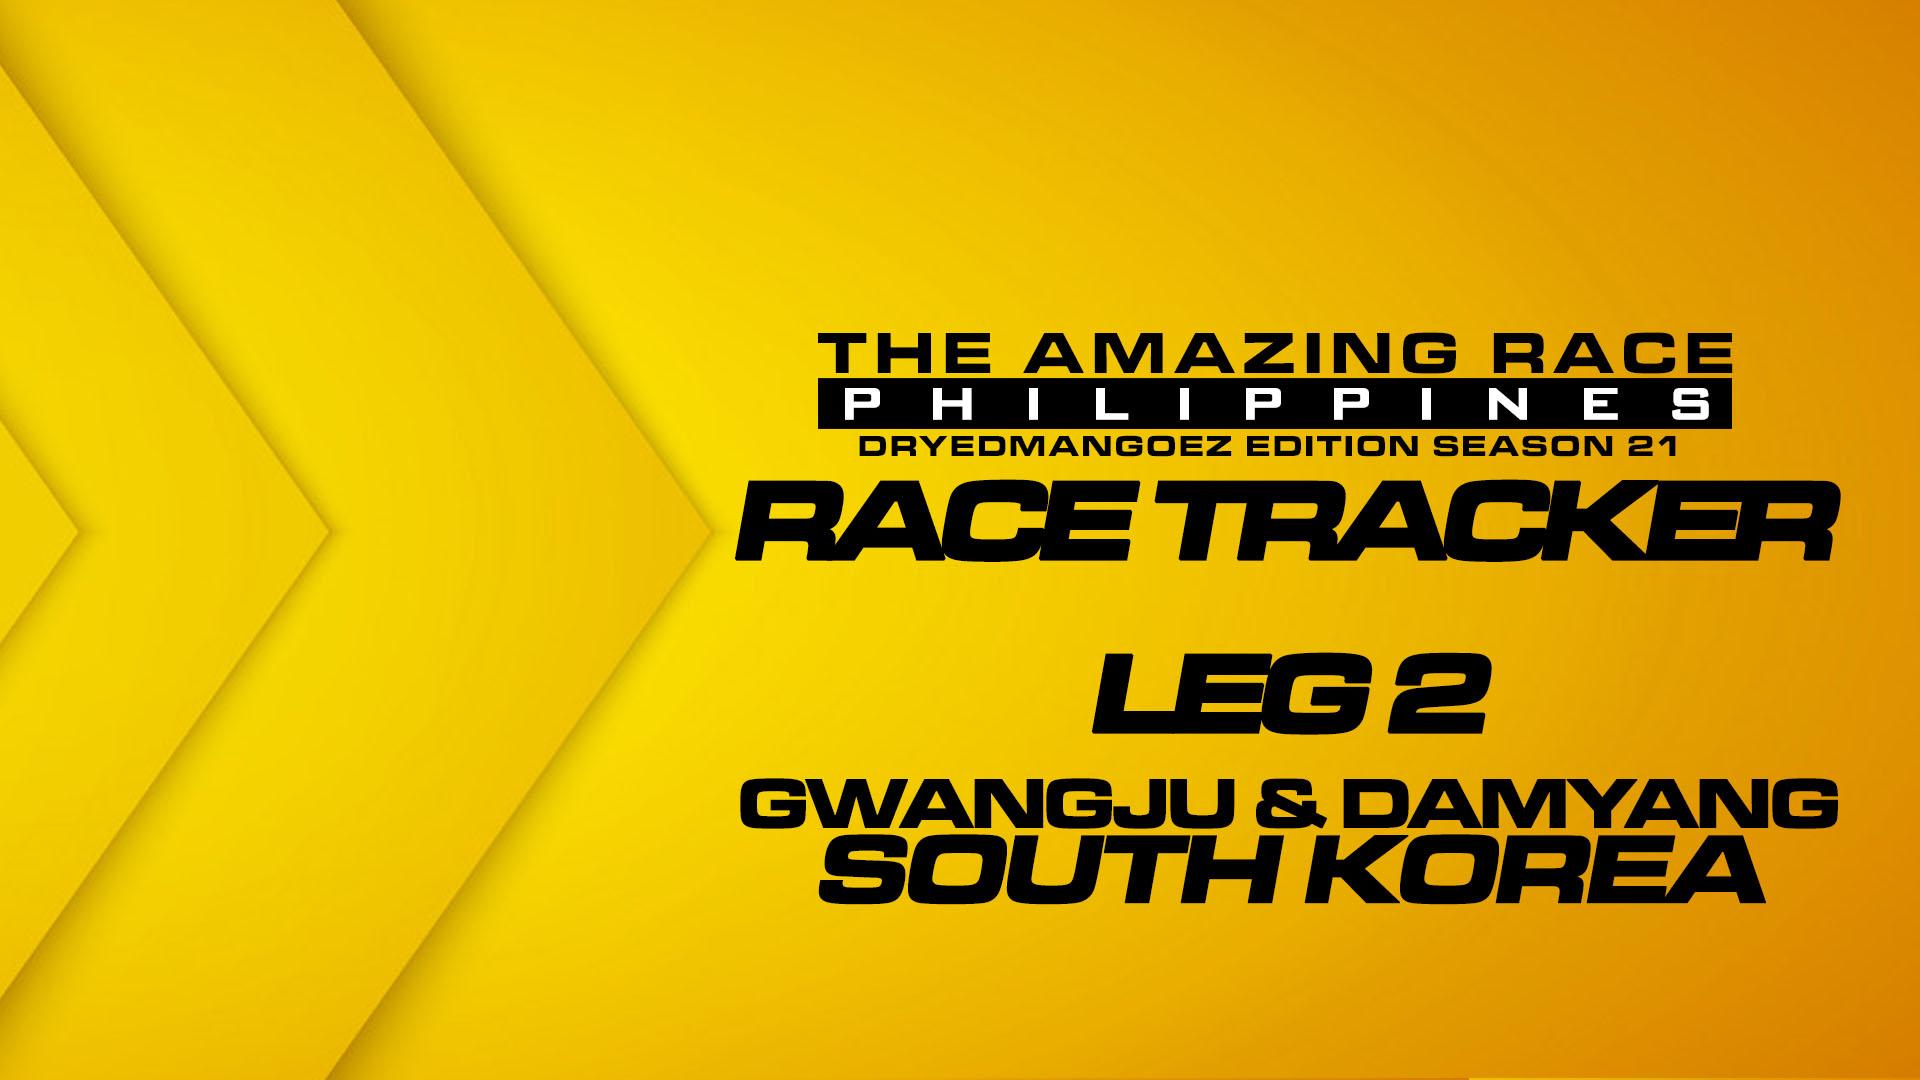 The Amazing Race Philippines: DryedMangoez Edition Season 21 Race Tracker – Leg 2